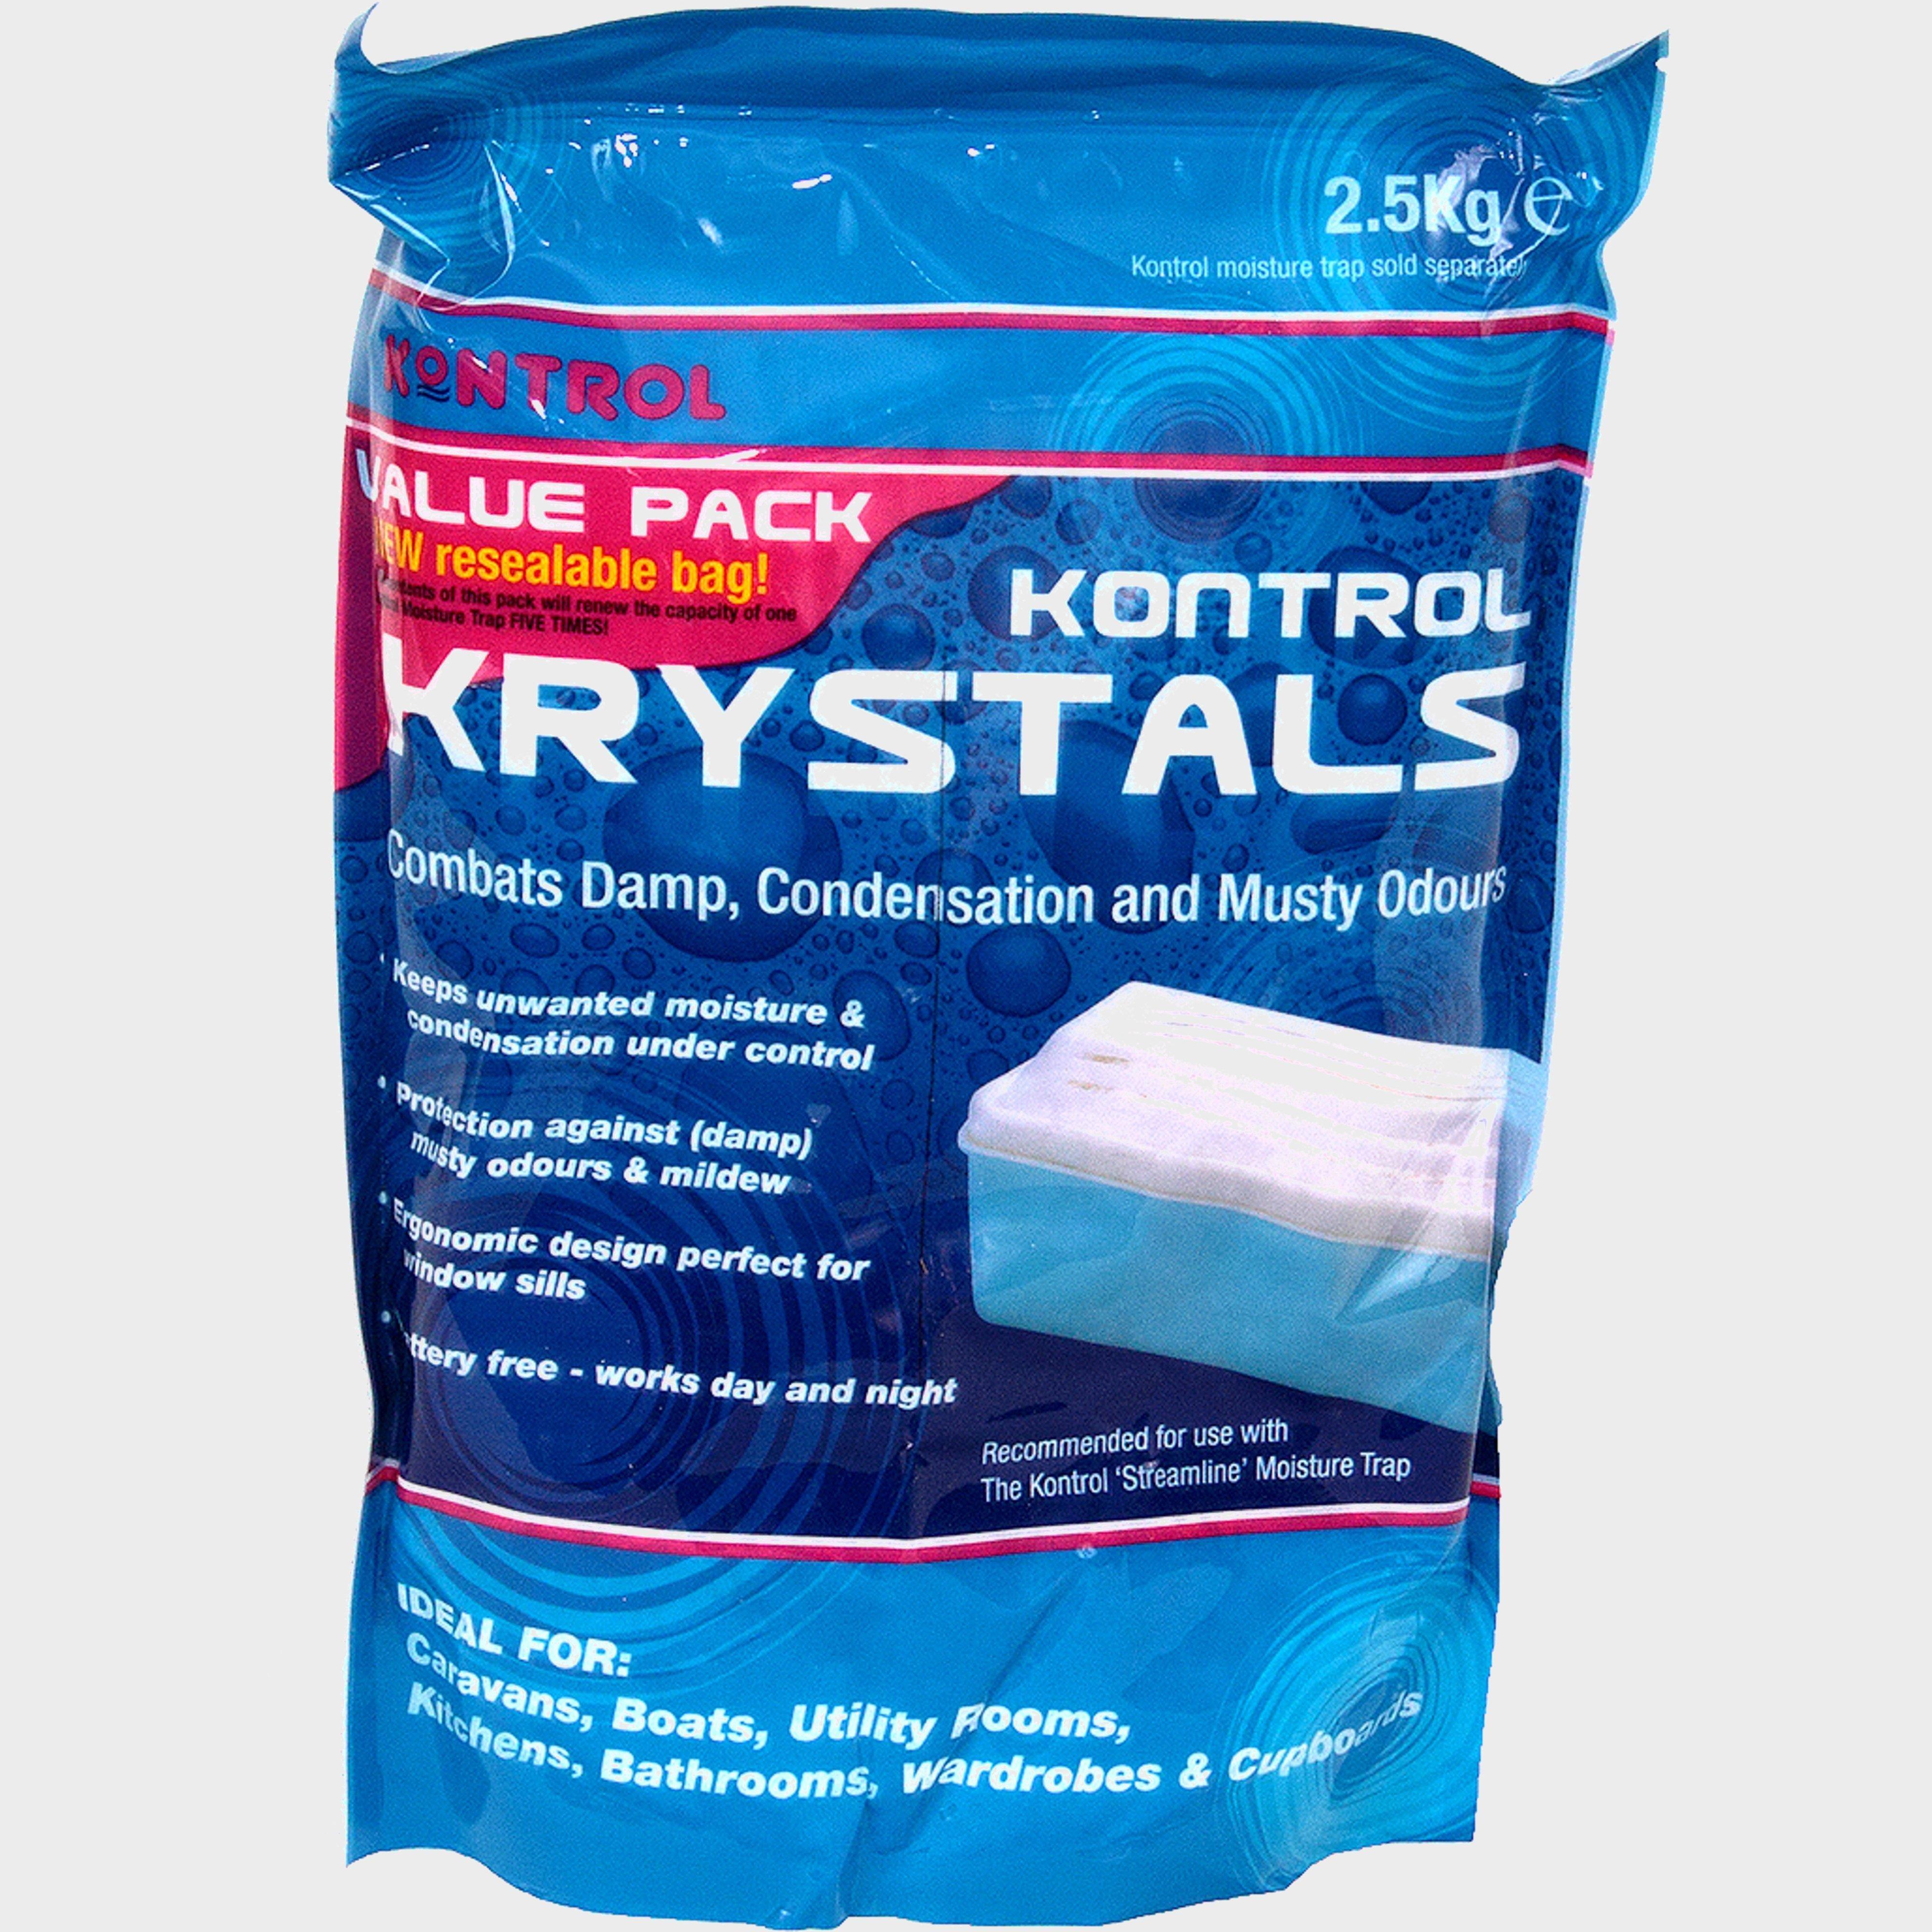 Quest Quest Krystals Moisture Trap Refill (2.5kg)